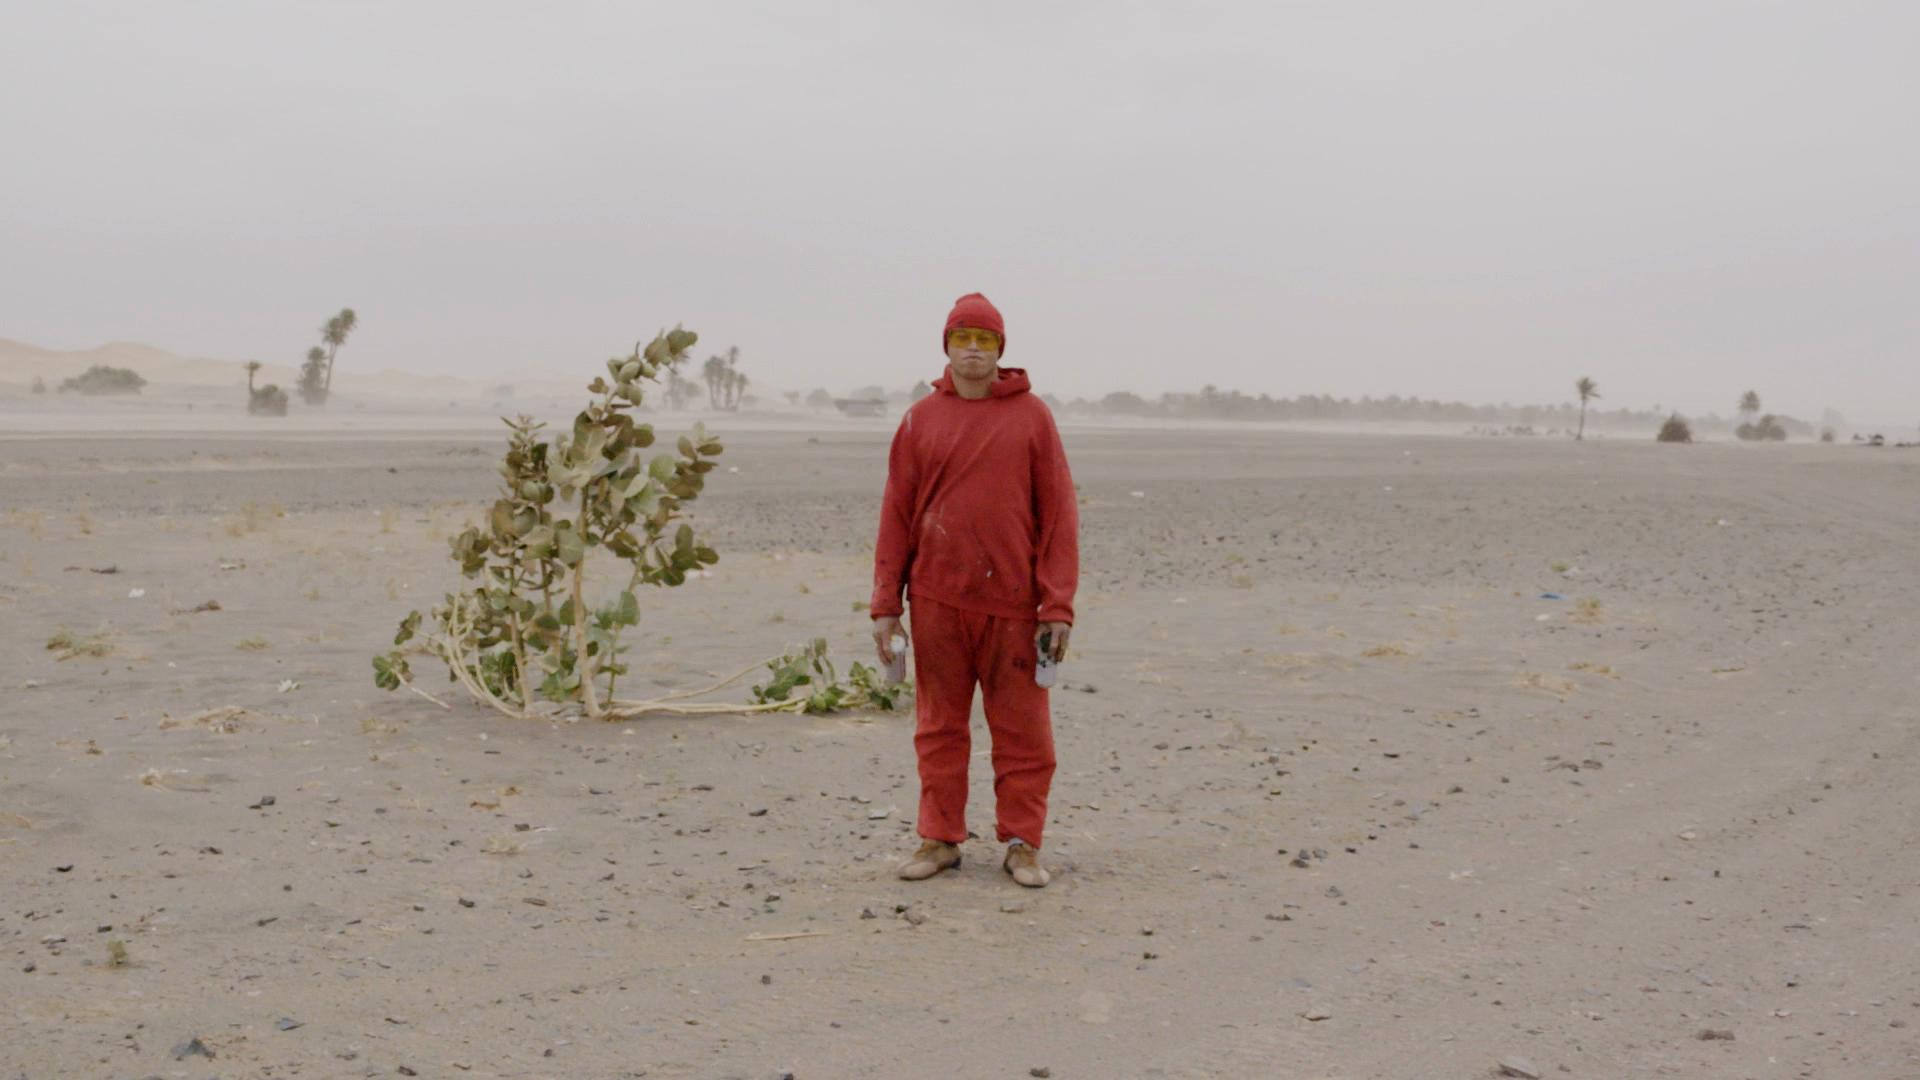 Man in the Desert. Igloo Hong, Morocco.